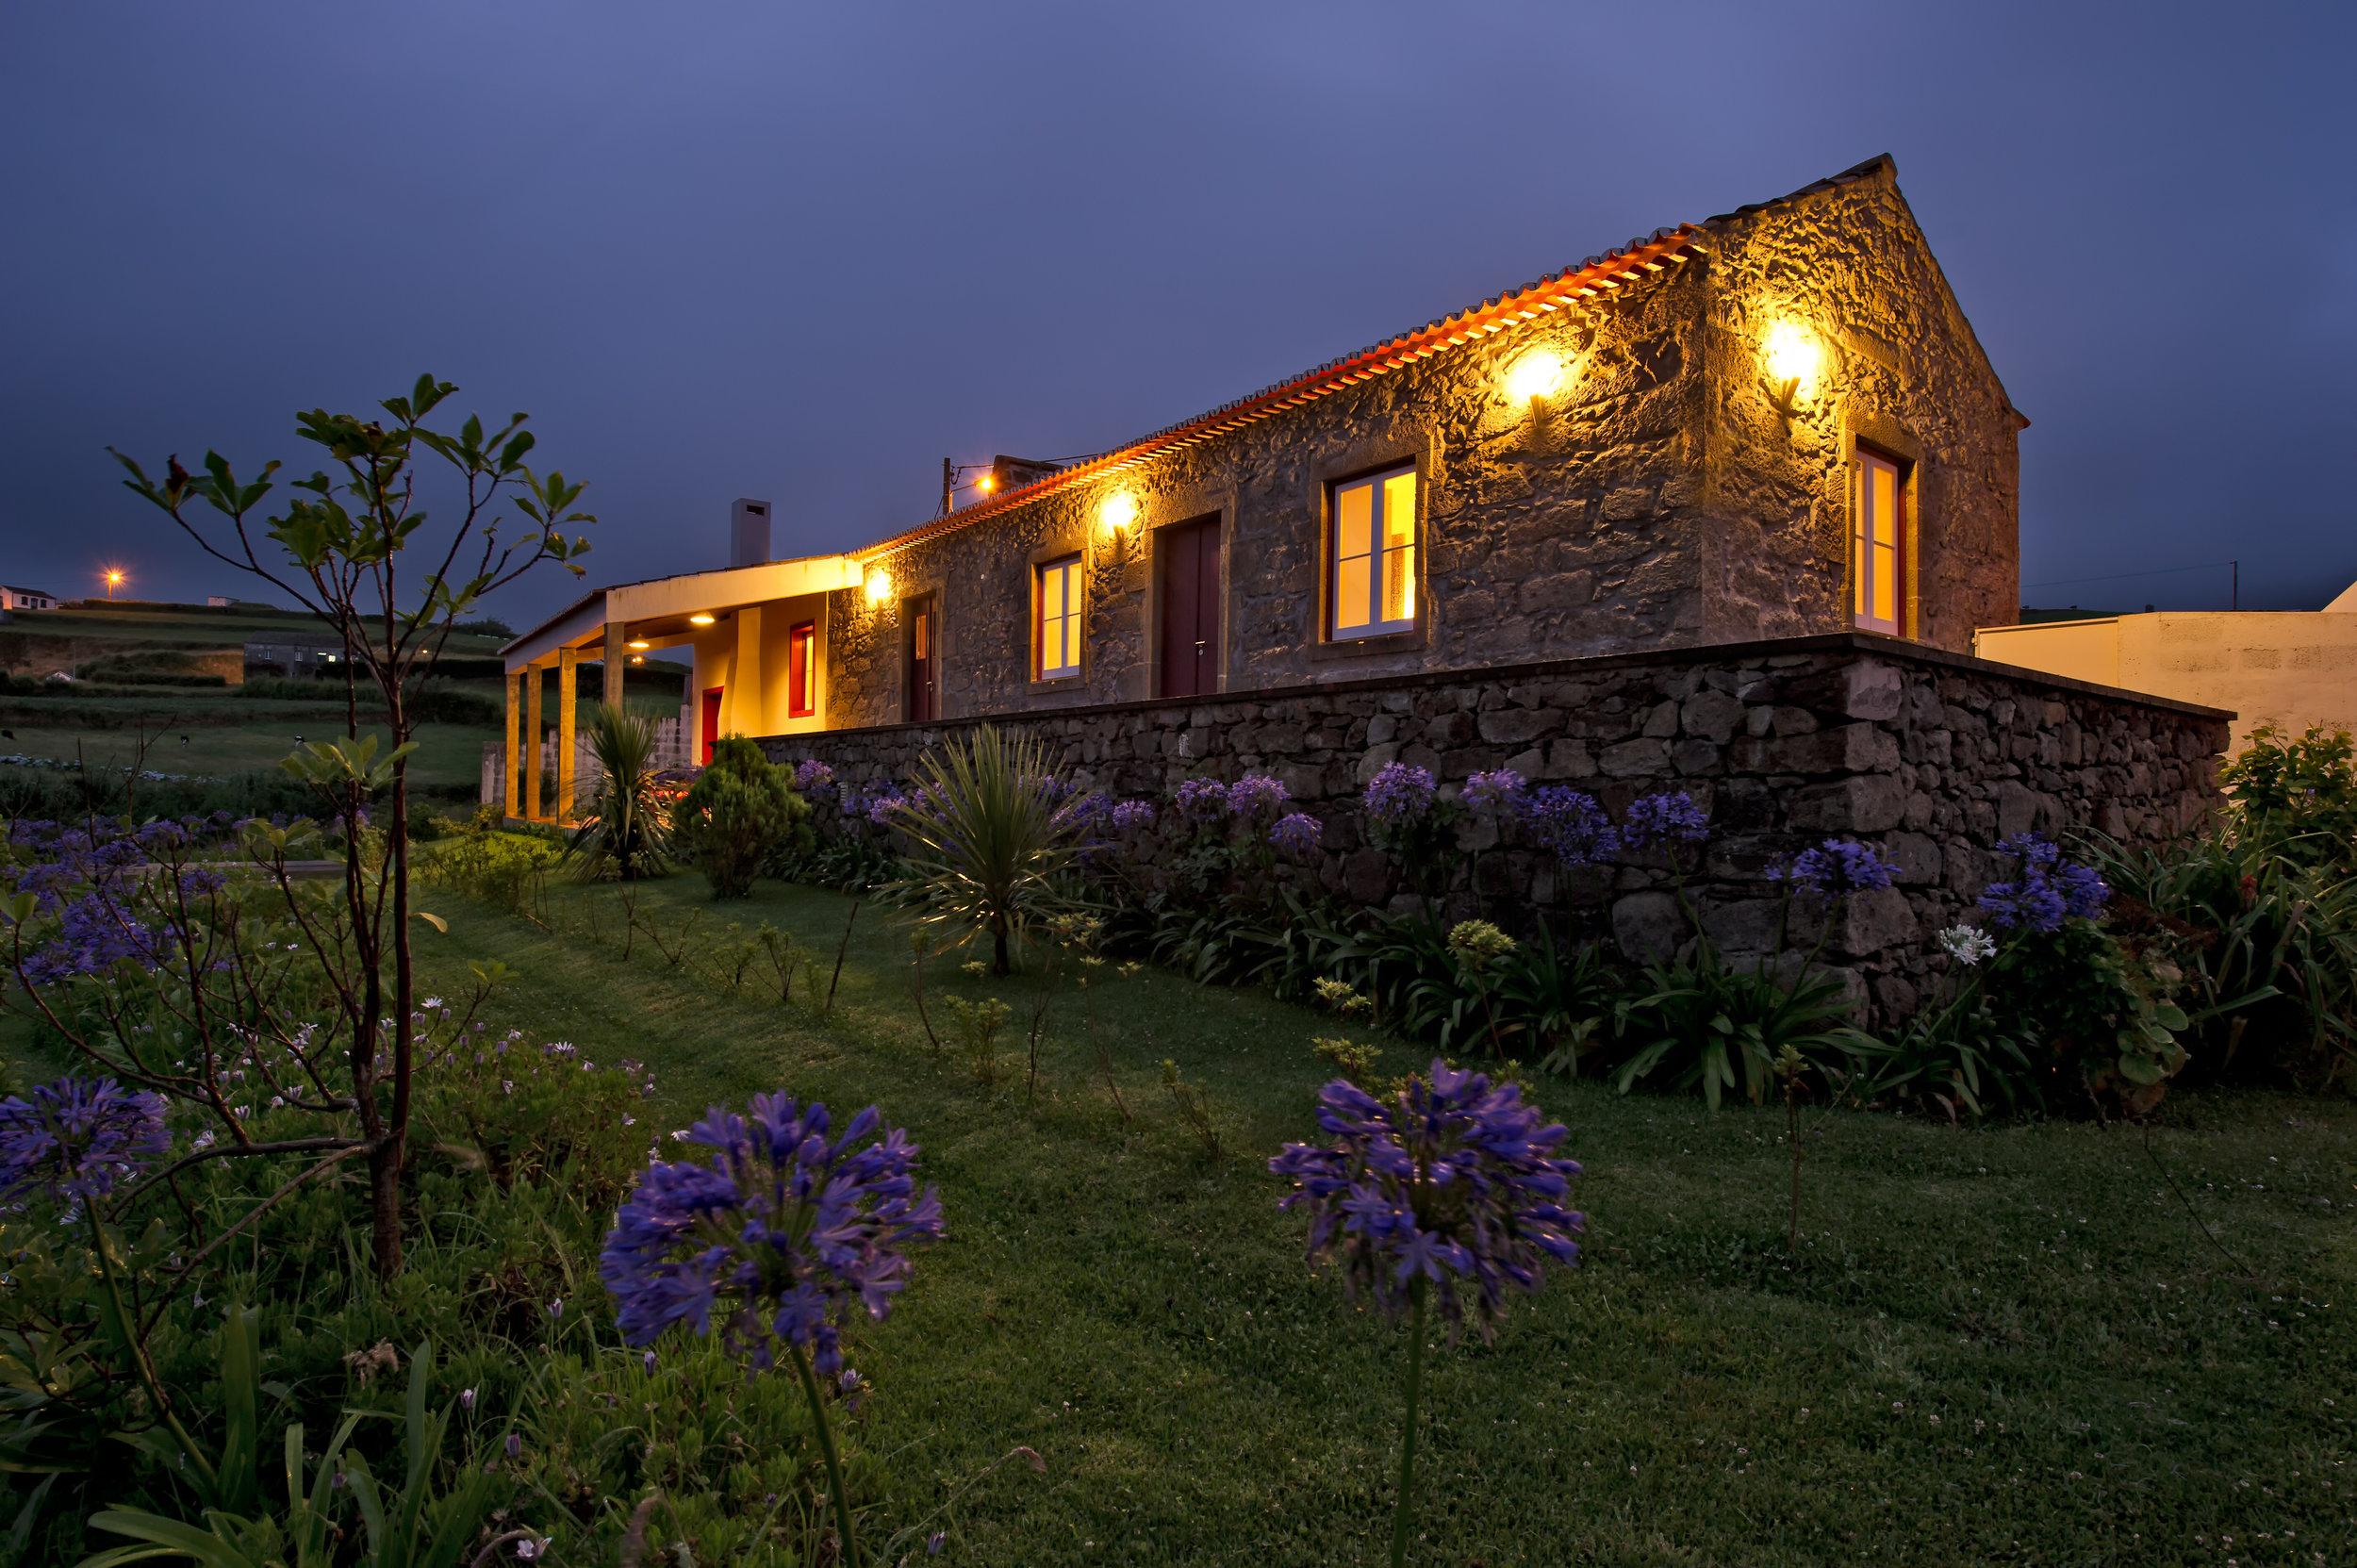 Azores Rustic Cottages - São Miguel